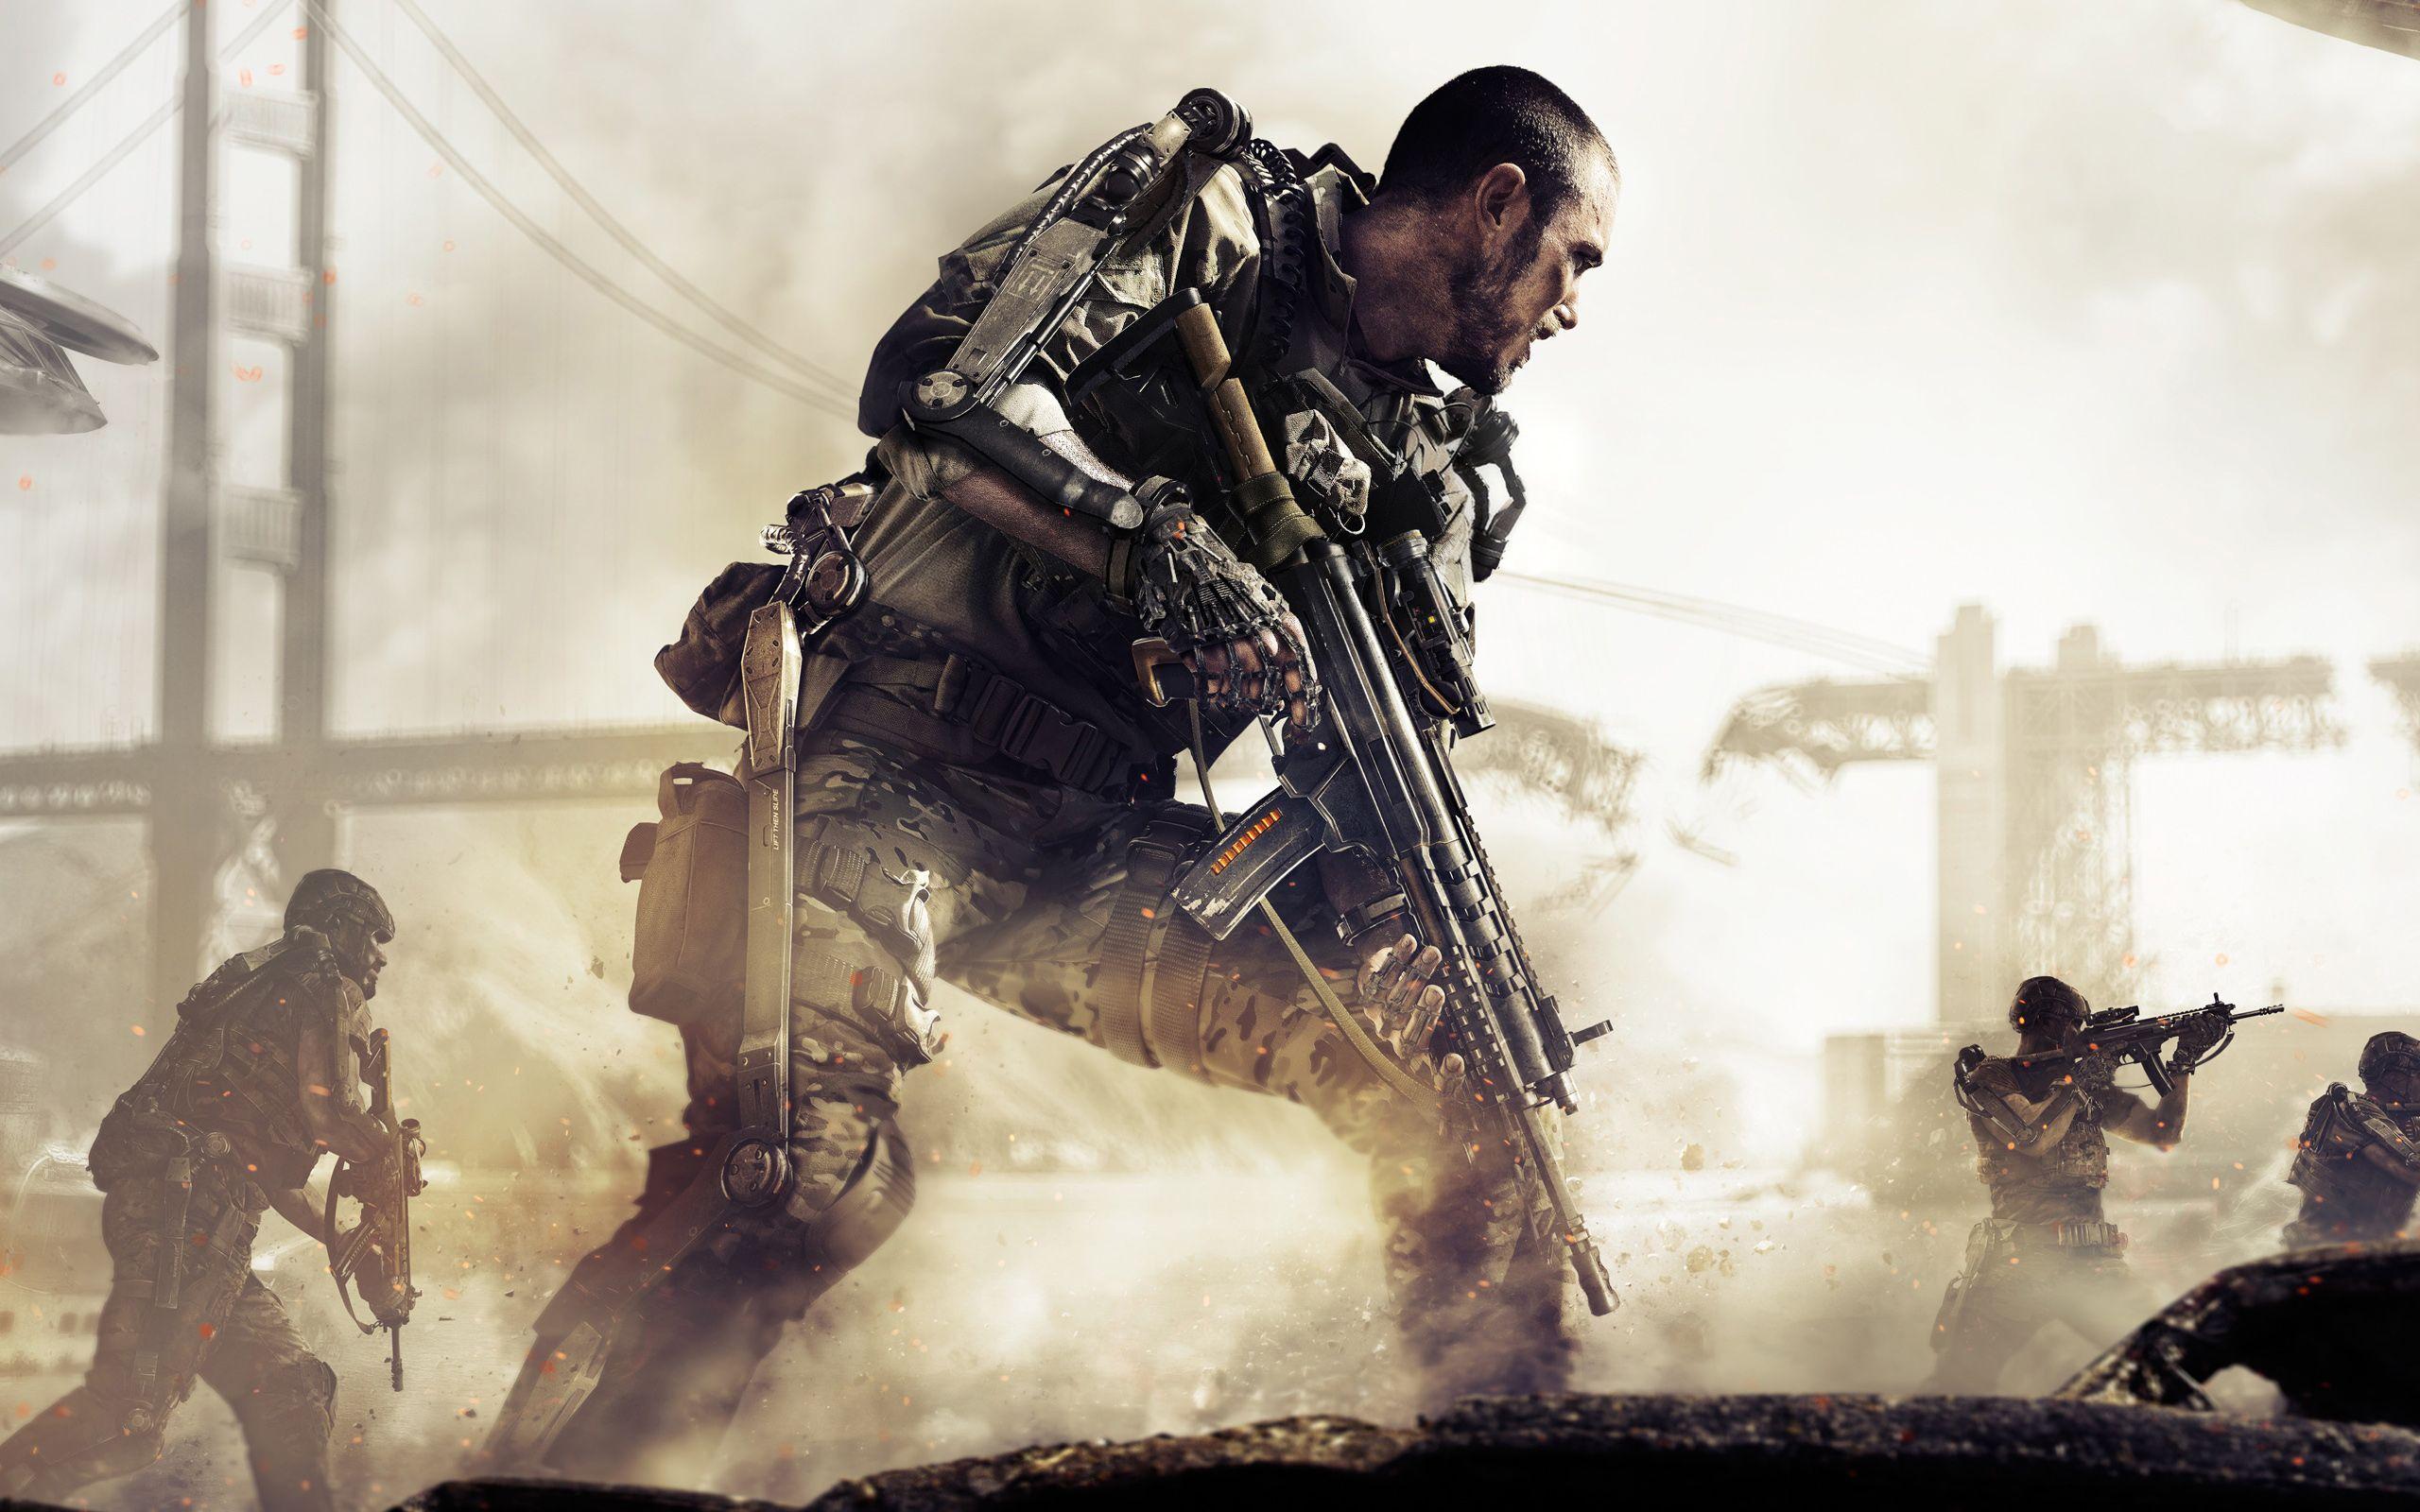 Call Of Duty Advanced Warfare Hd Wallpapers Wallpaper Cave